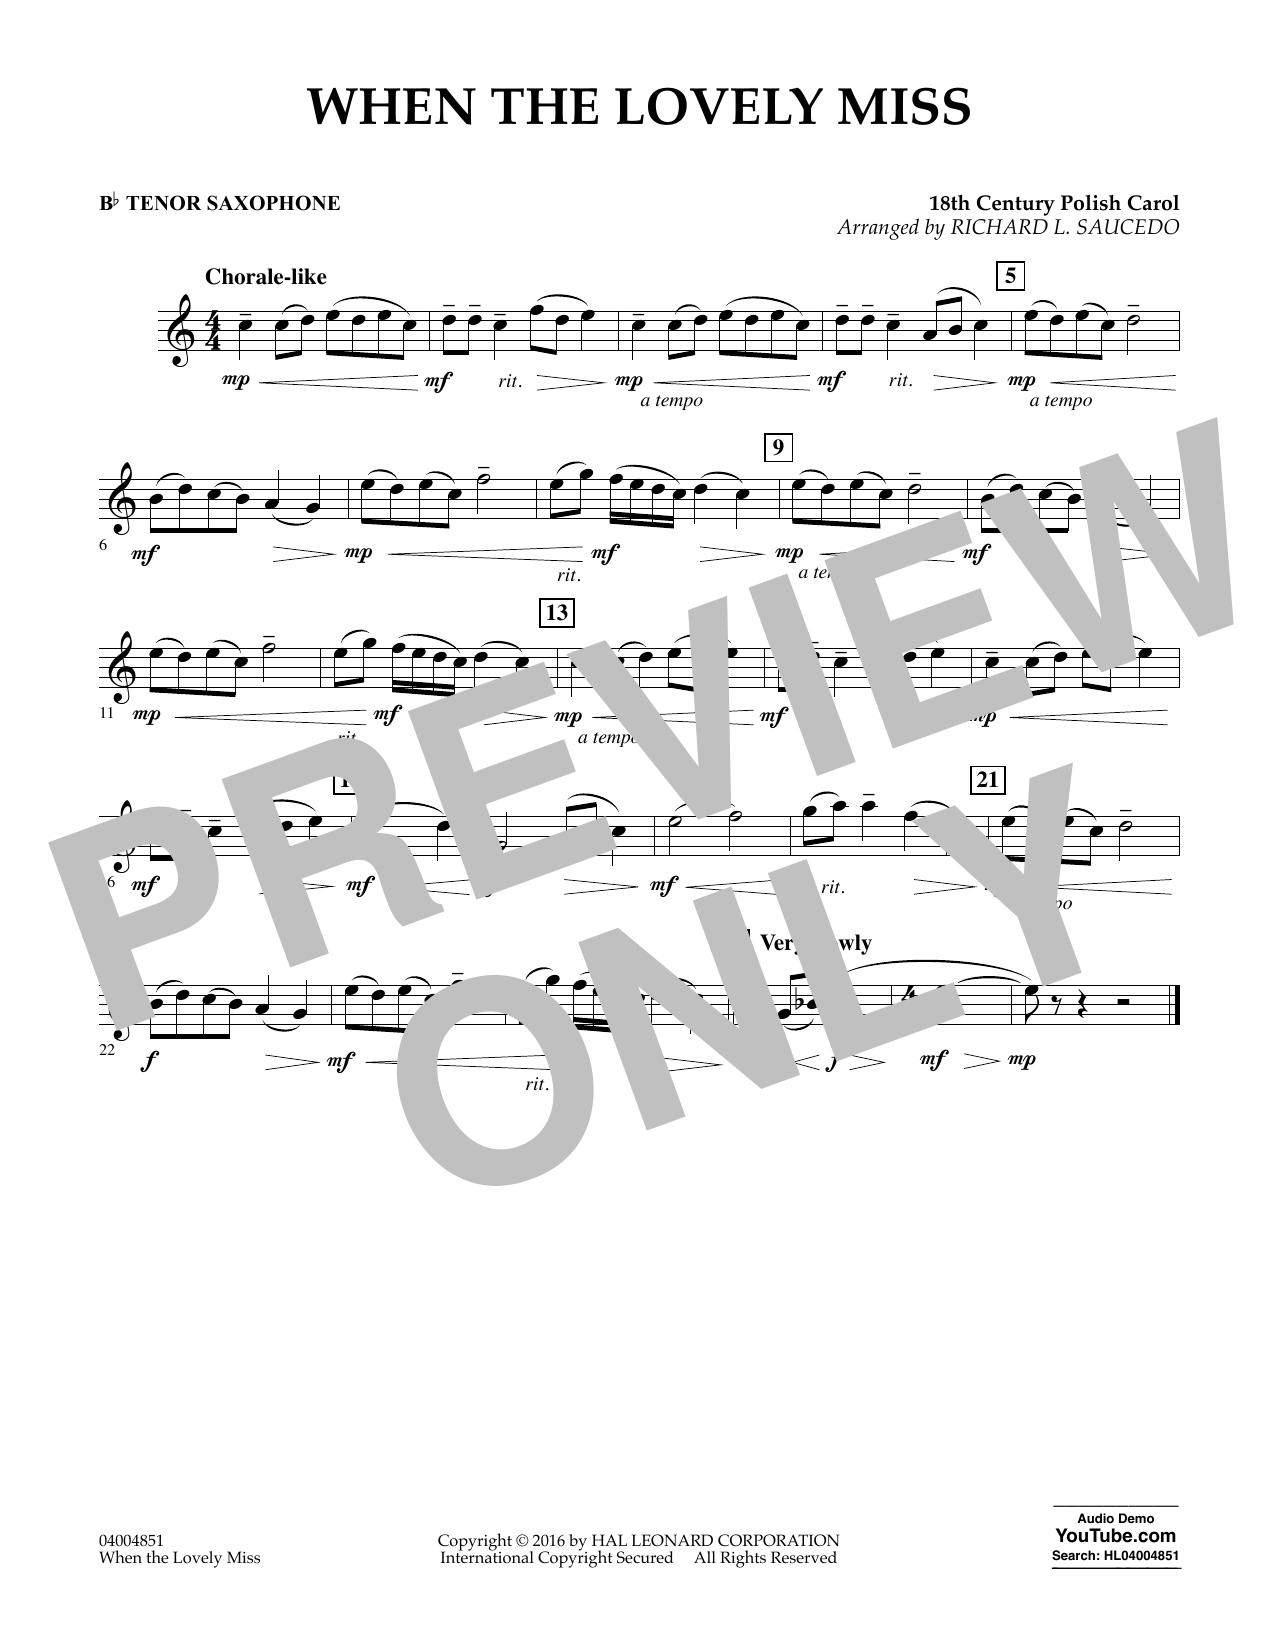 When the Lovely Miss (18th Century Polish Carol) - Bb Tenor Saxophone (Concert Band)